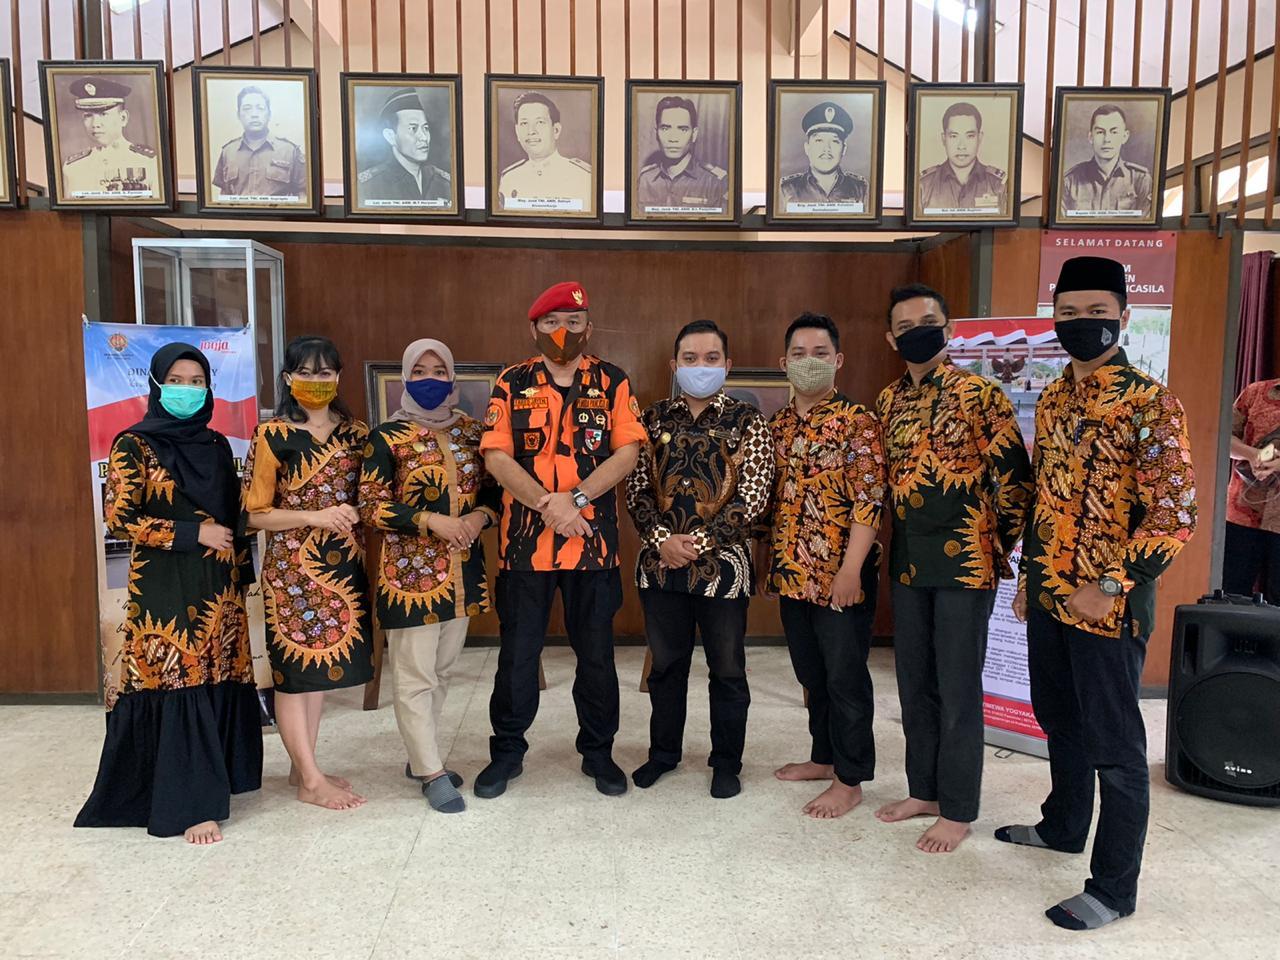 Peringati Hari Kesaktian Pancasila Ke-55, Duta Museum DIY Bersama Pemuda Pancasila Gelar Napak Tilas G30S/PKI dan Tahlilan